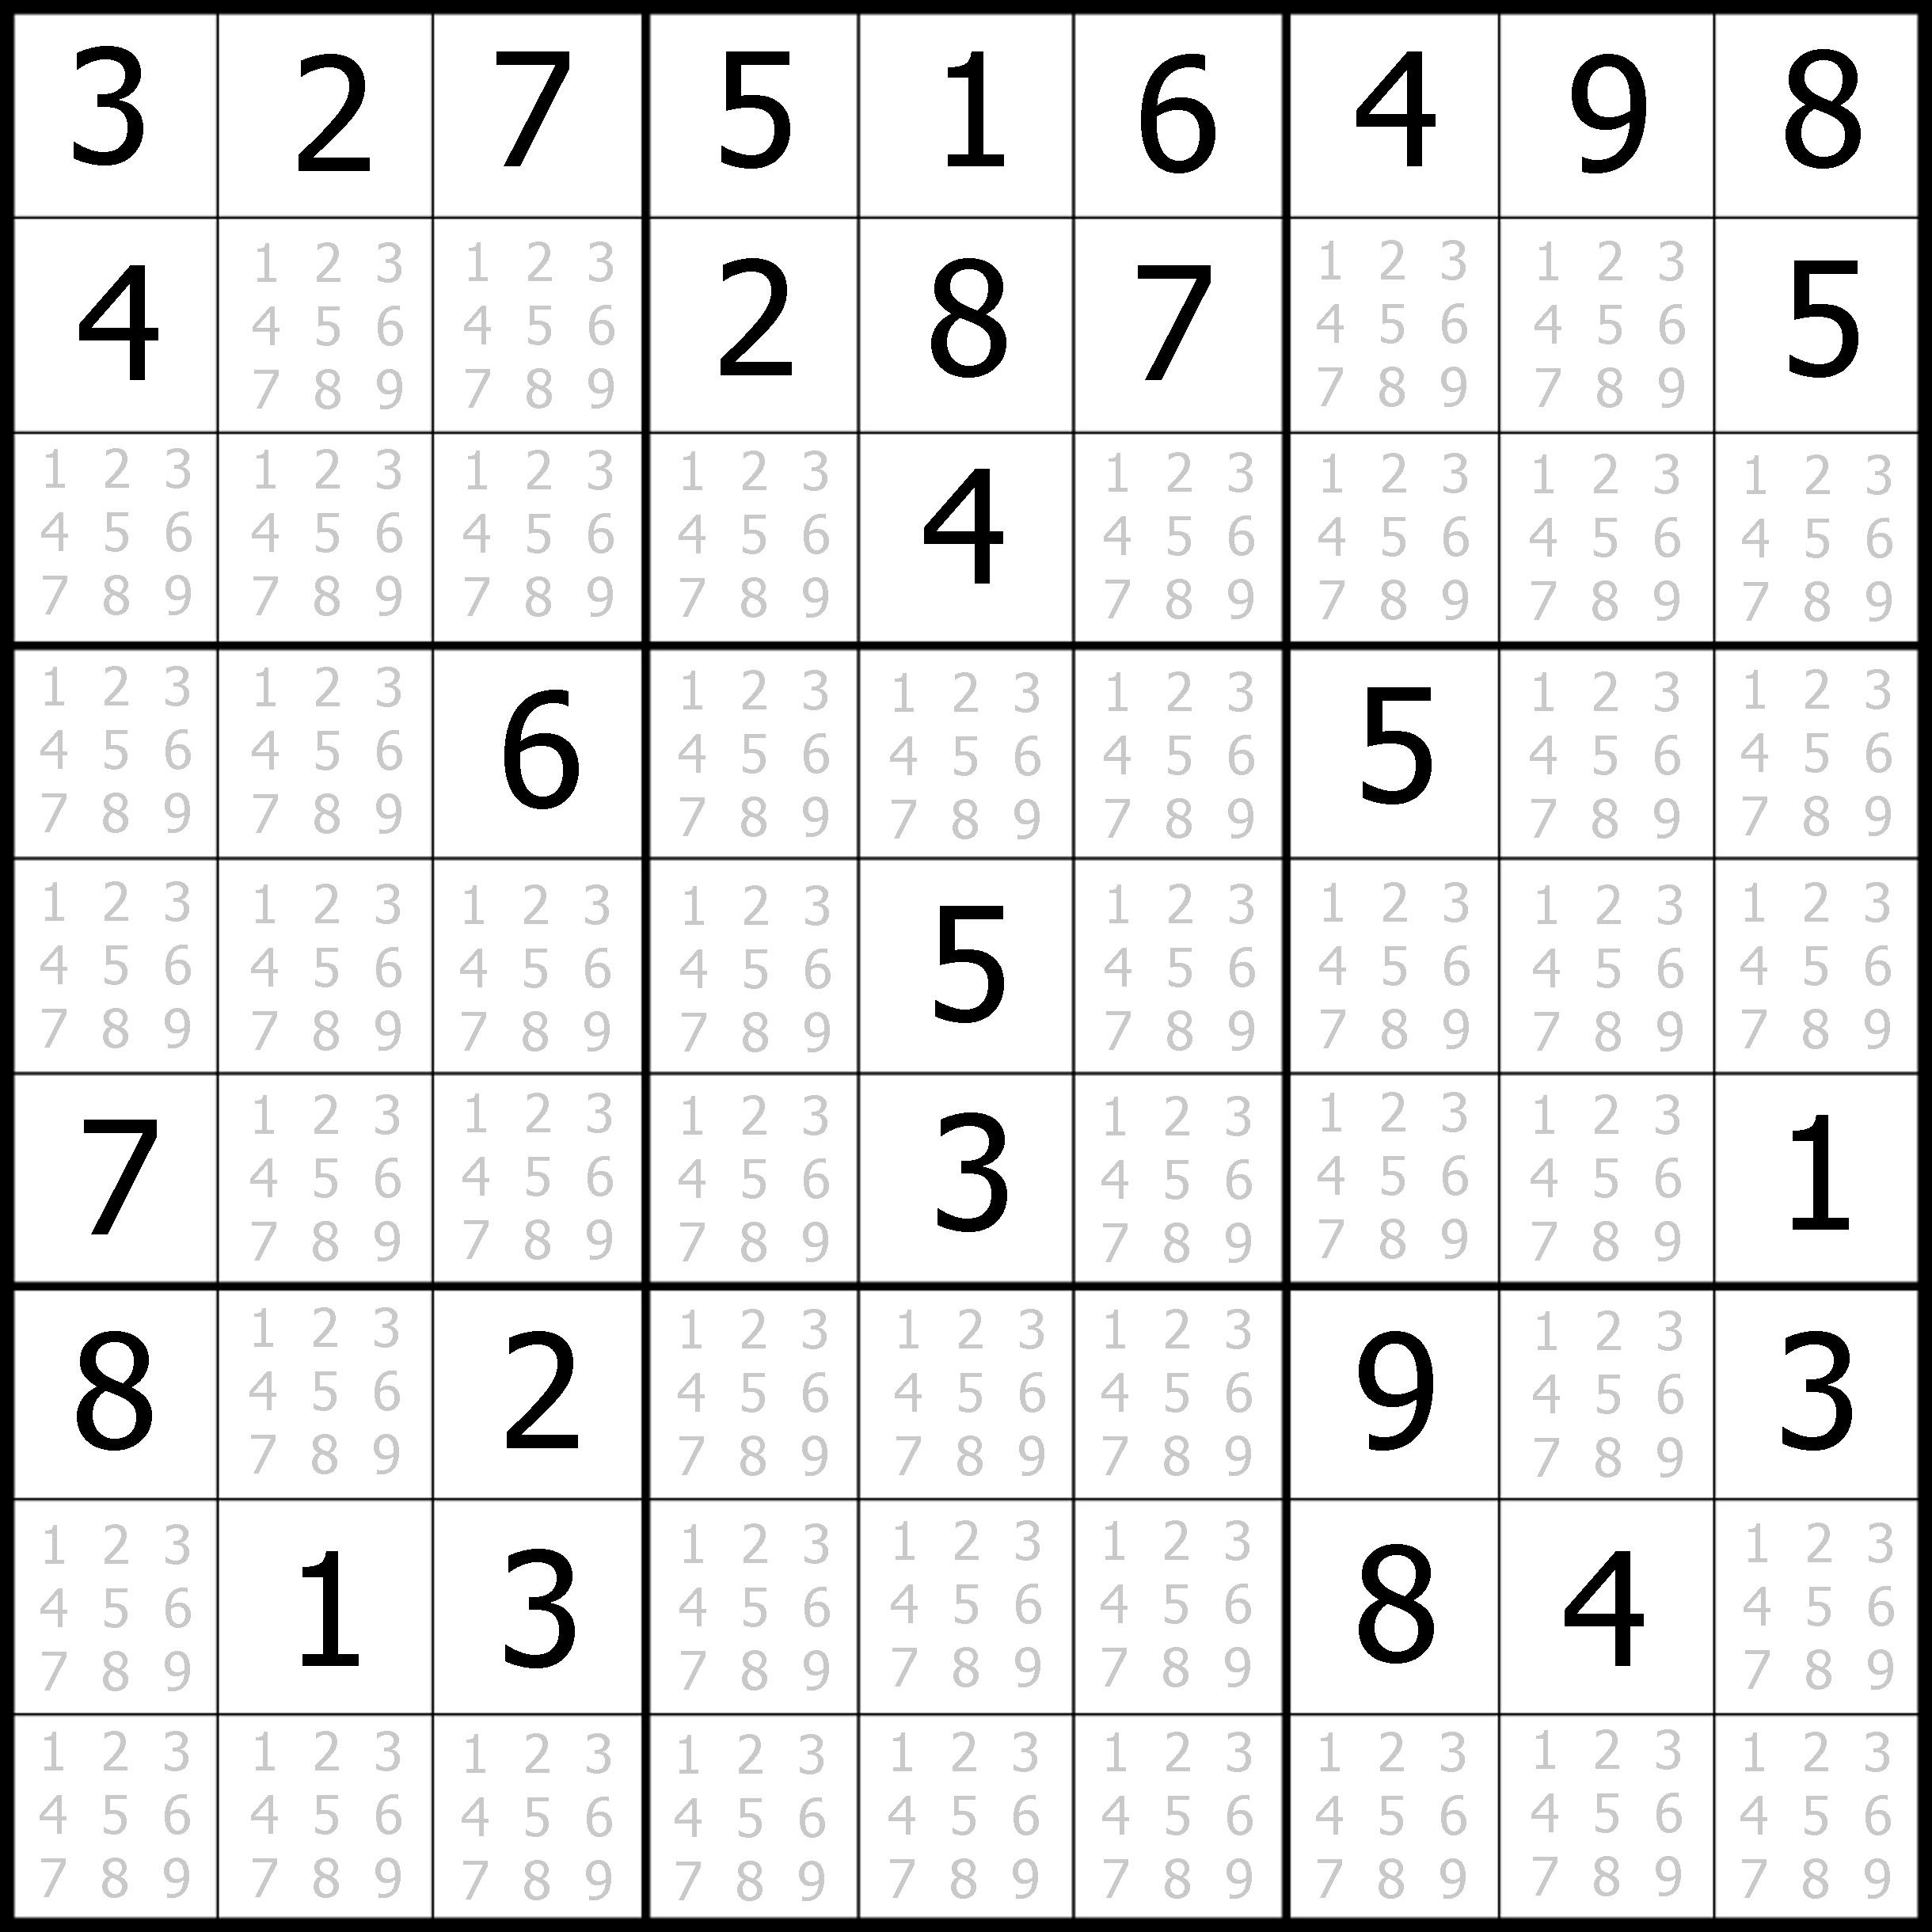 Free Easy Sudoku Puzzles Printable